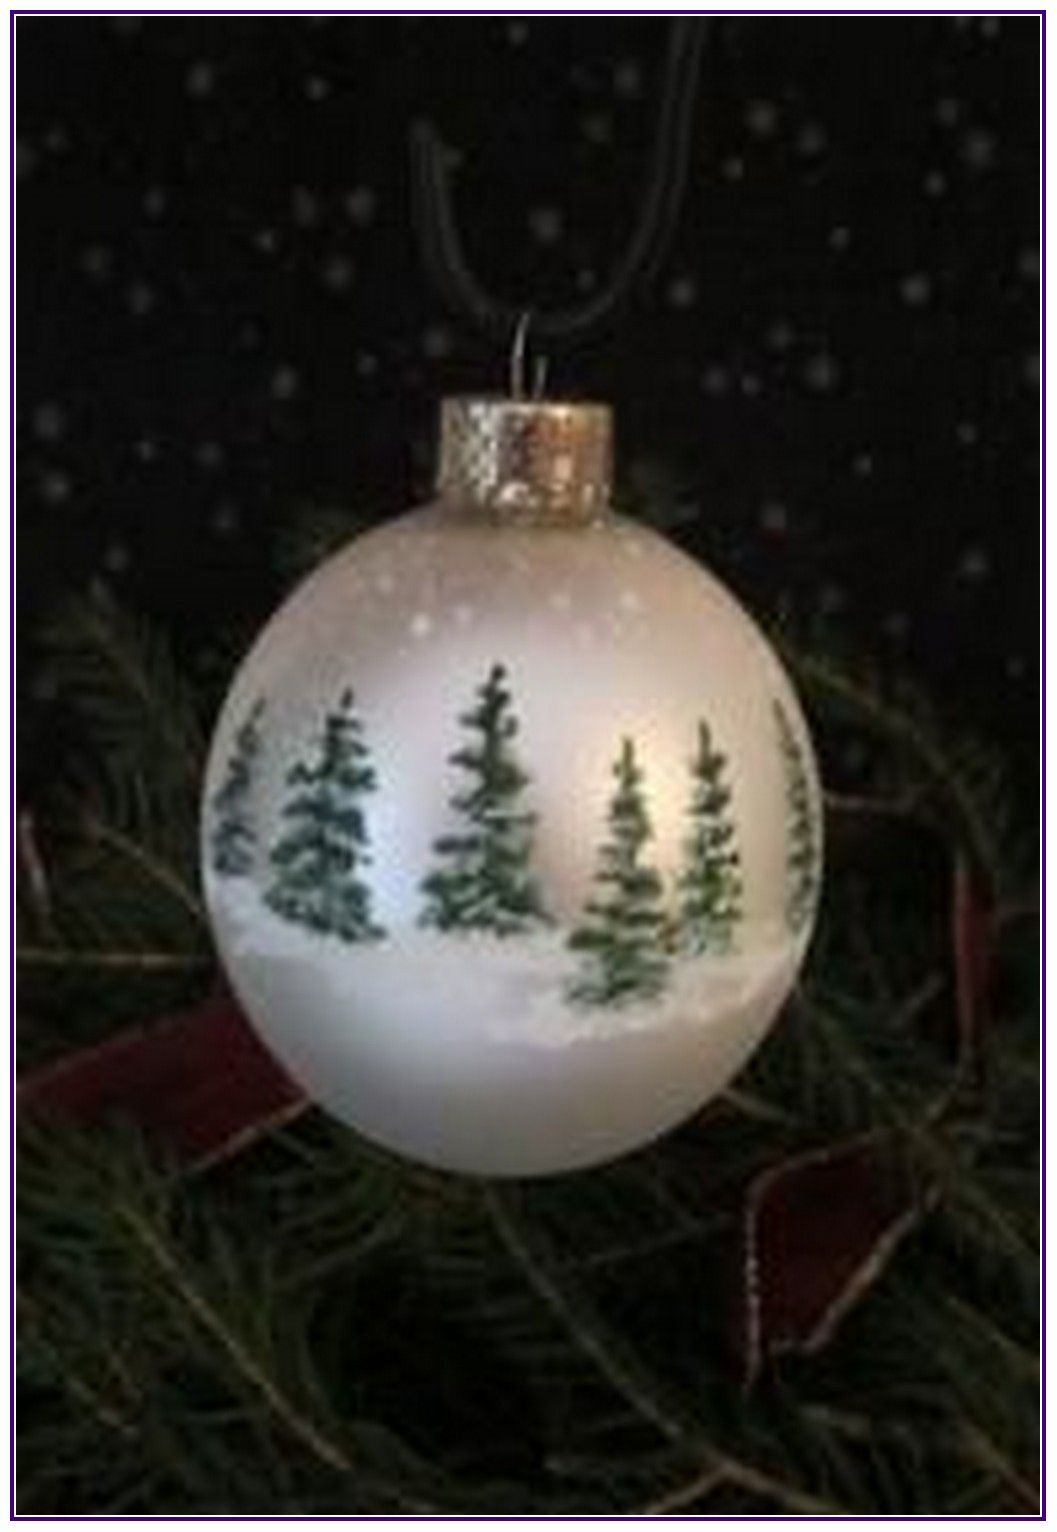 25 Easy Diy Christmas Ornaments For A Personalized Tree Decor 00013 Winzipdownl Christmas Ornaments Diy Christmas Ornaments Easy Handmade Christmas Ornaments